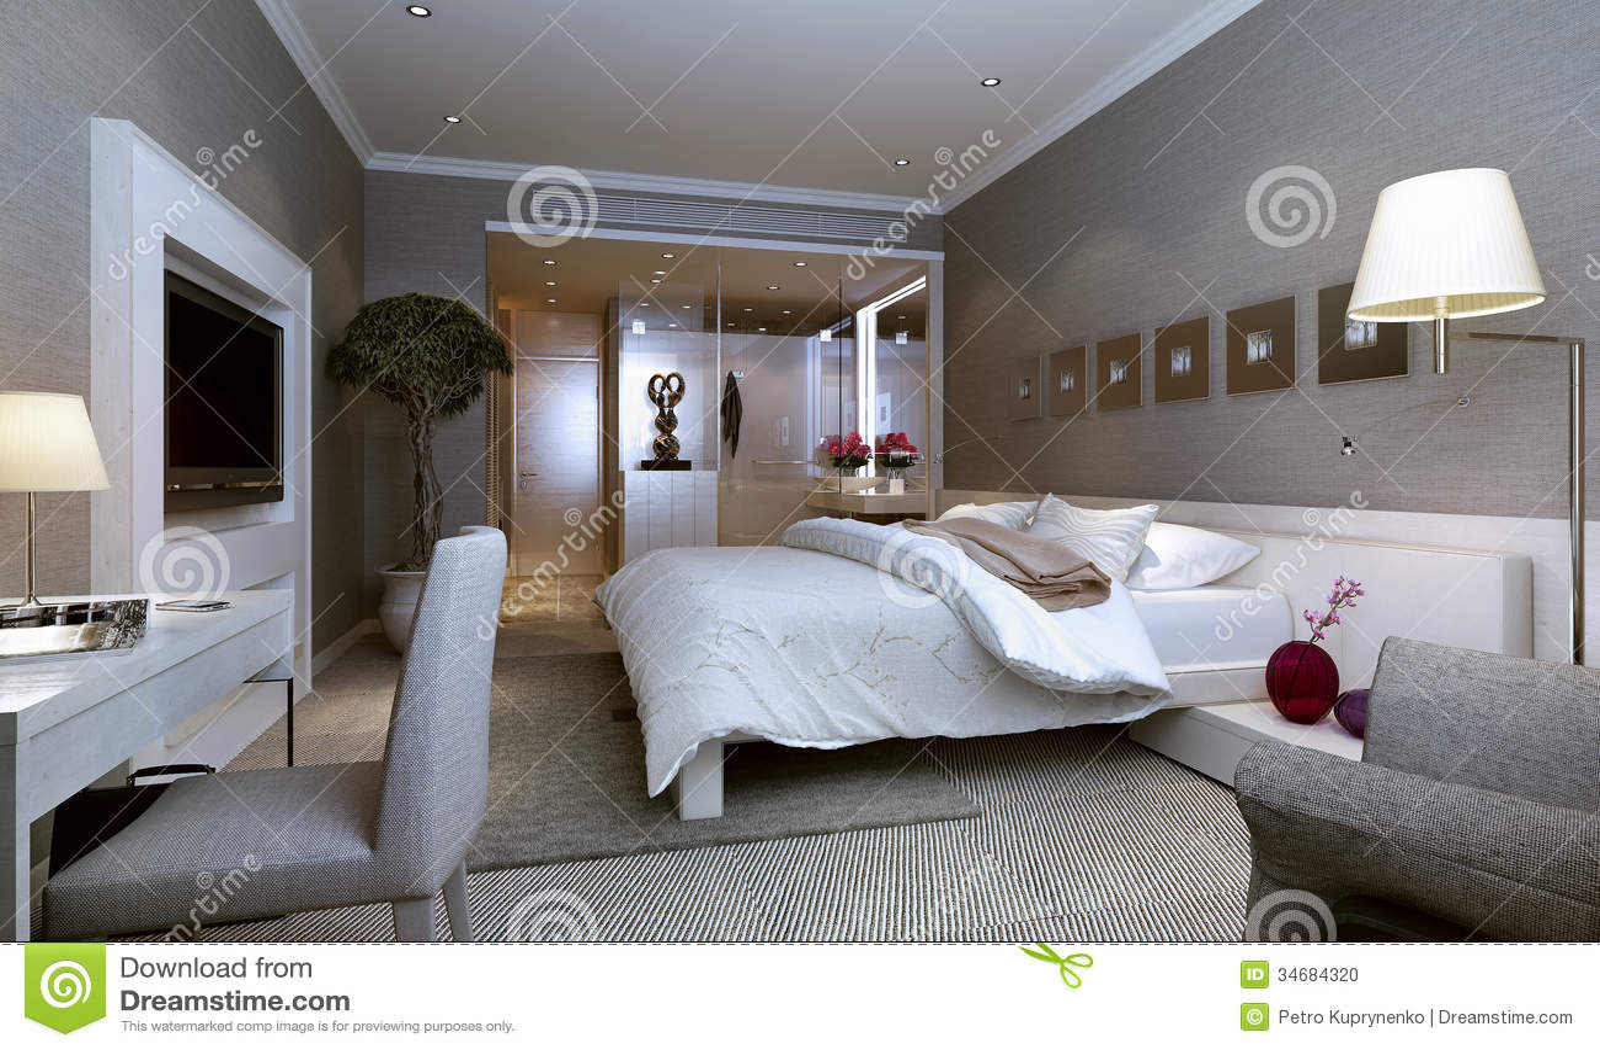 Cuartos de invitados interiores modernos foto de archivo for Ideas e interiores